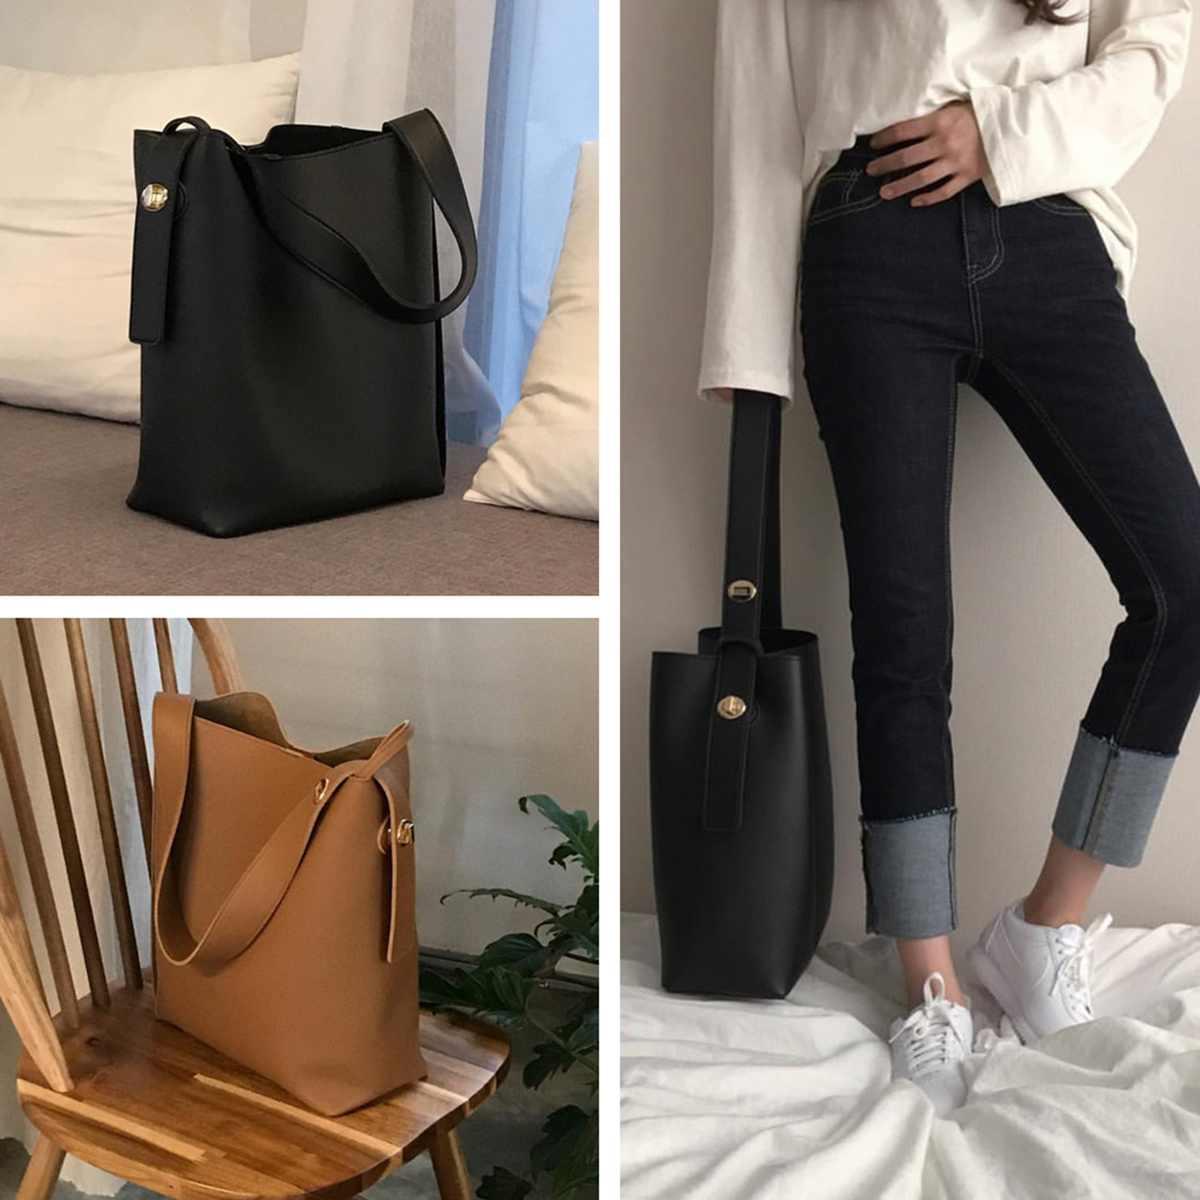 Fashion All-match Bucket Bag Korean Simple Style PU Leather Single Shoulder Women's Handbags Female Bag Casual Black/Light Brown